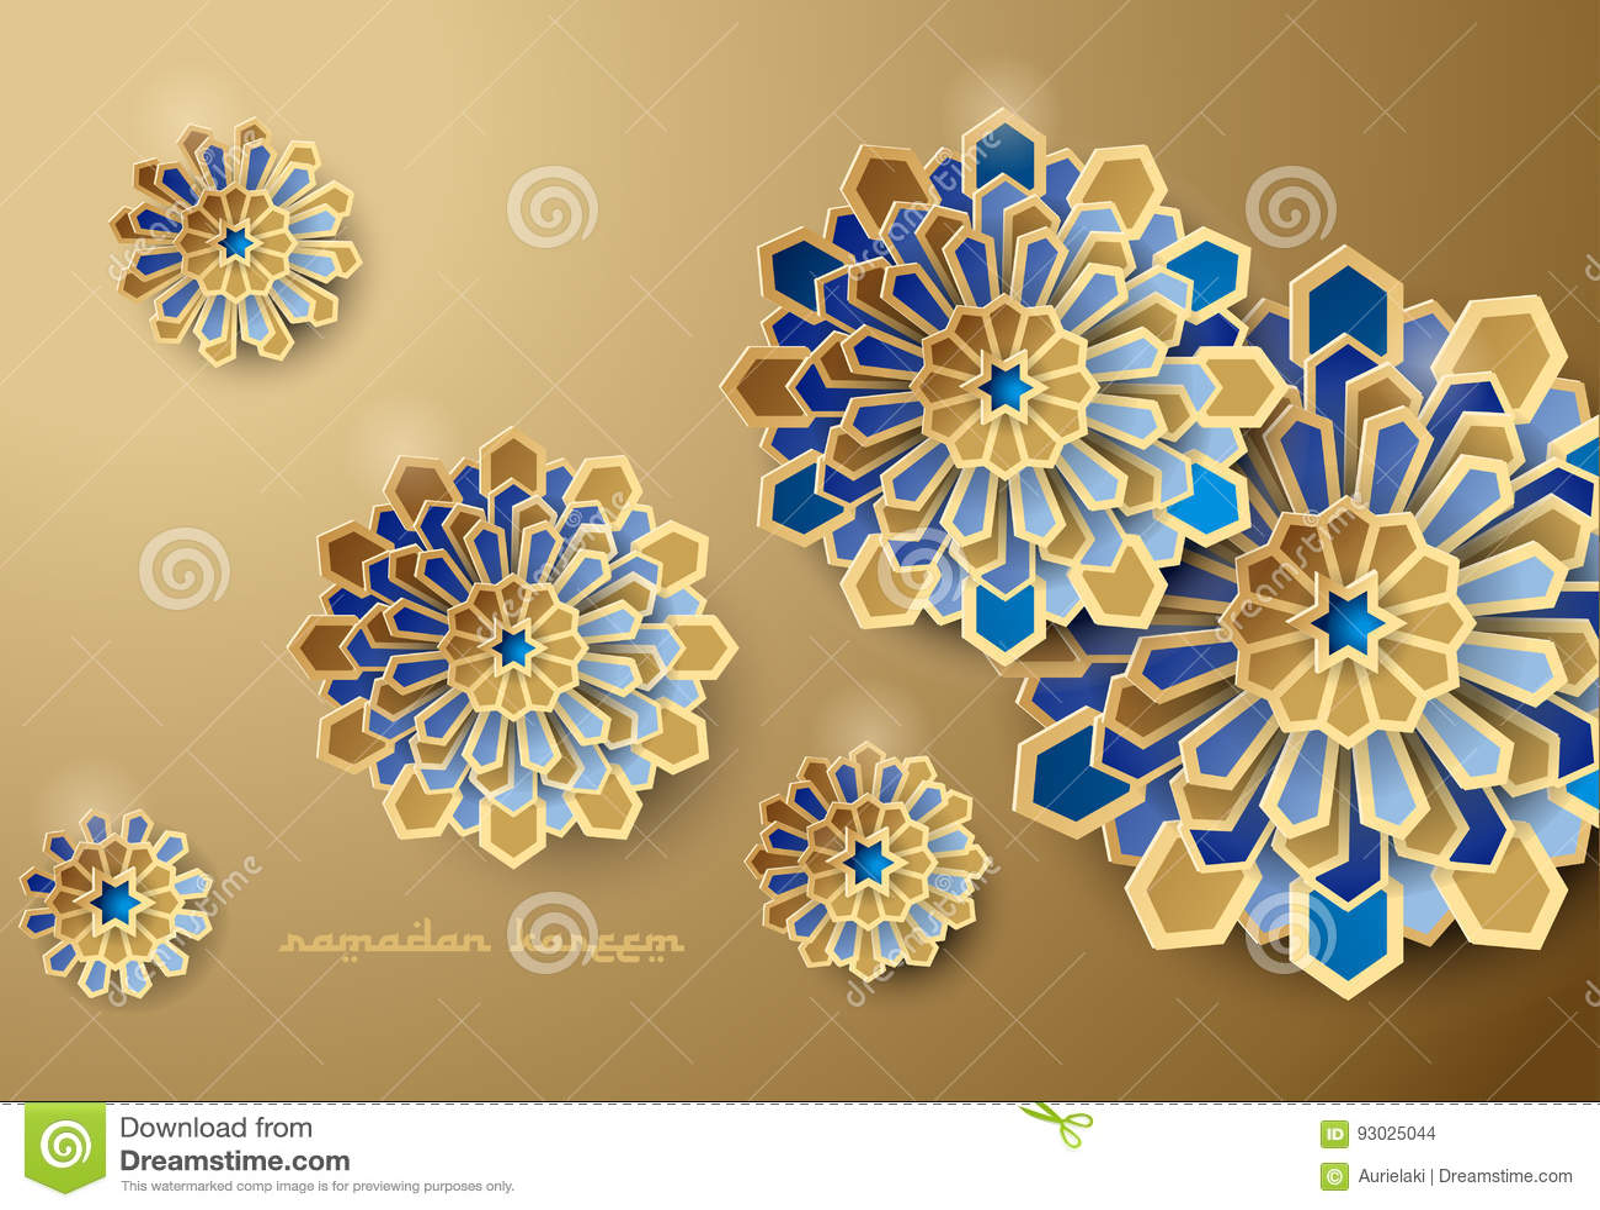 Geometric Decorative Islamic Art Ornament Vector Design Free